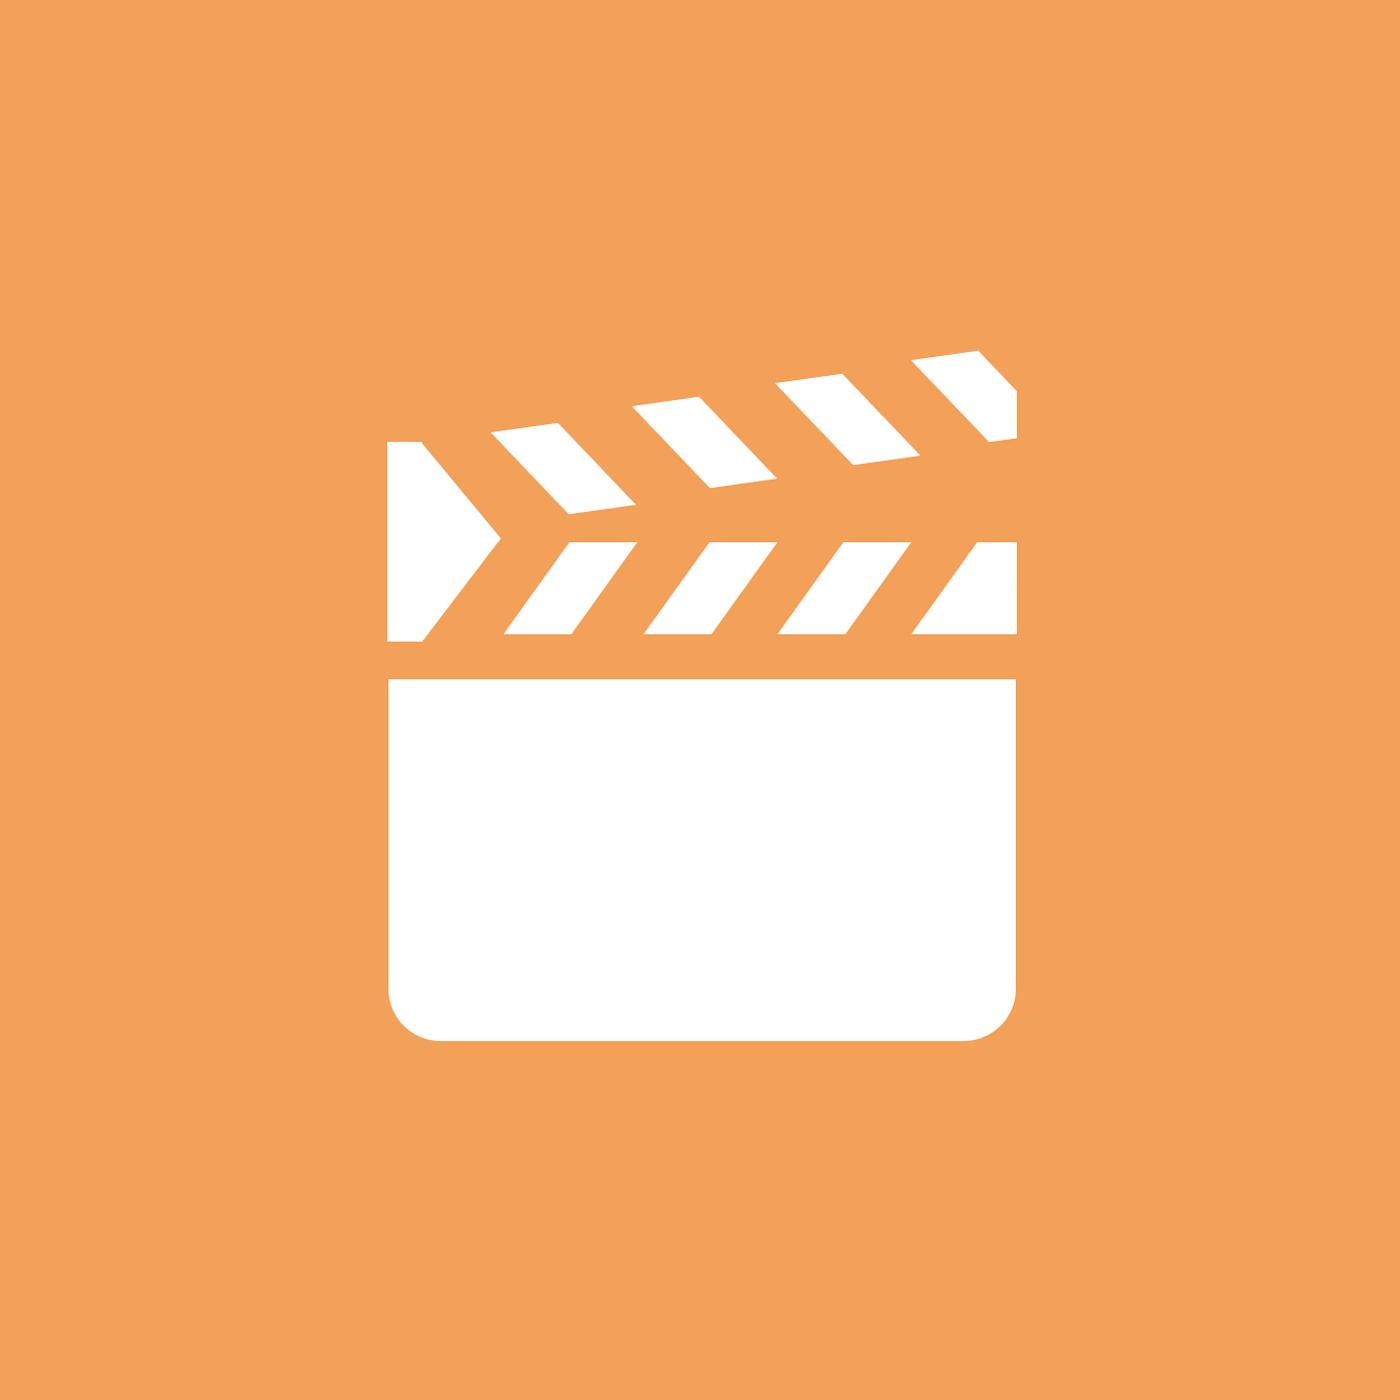 Final Cut Pro X Plugins from Pixel Film Studios - Pixel Film Studios